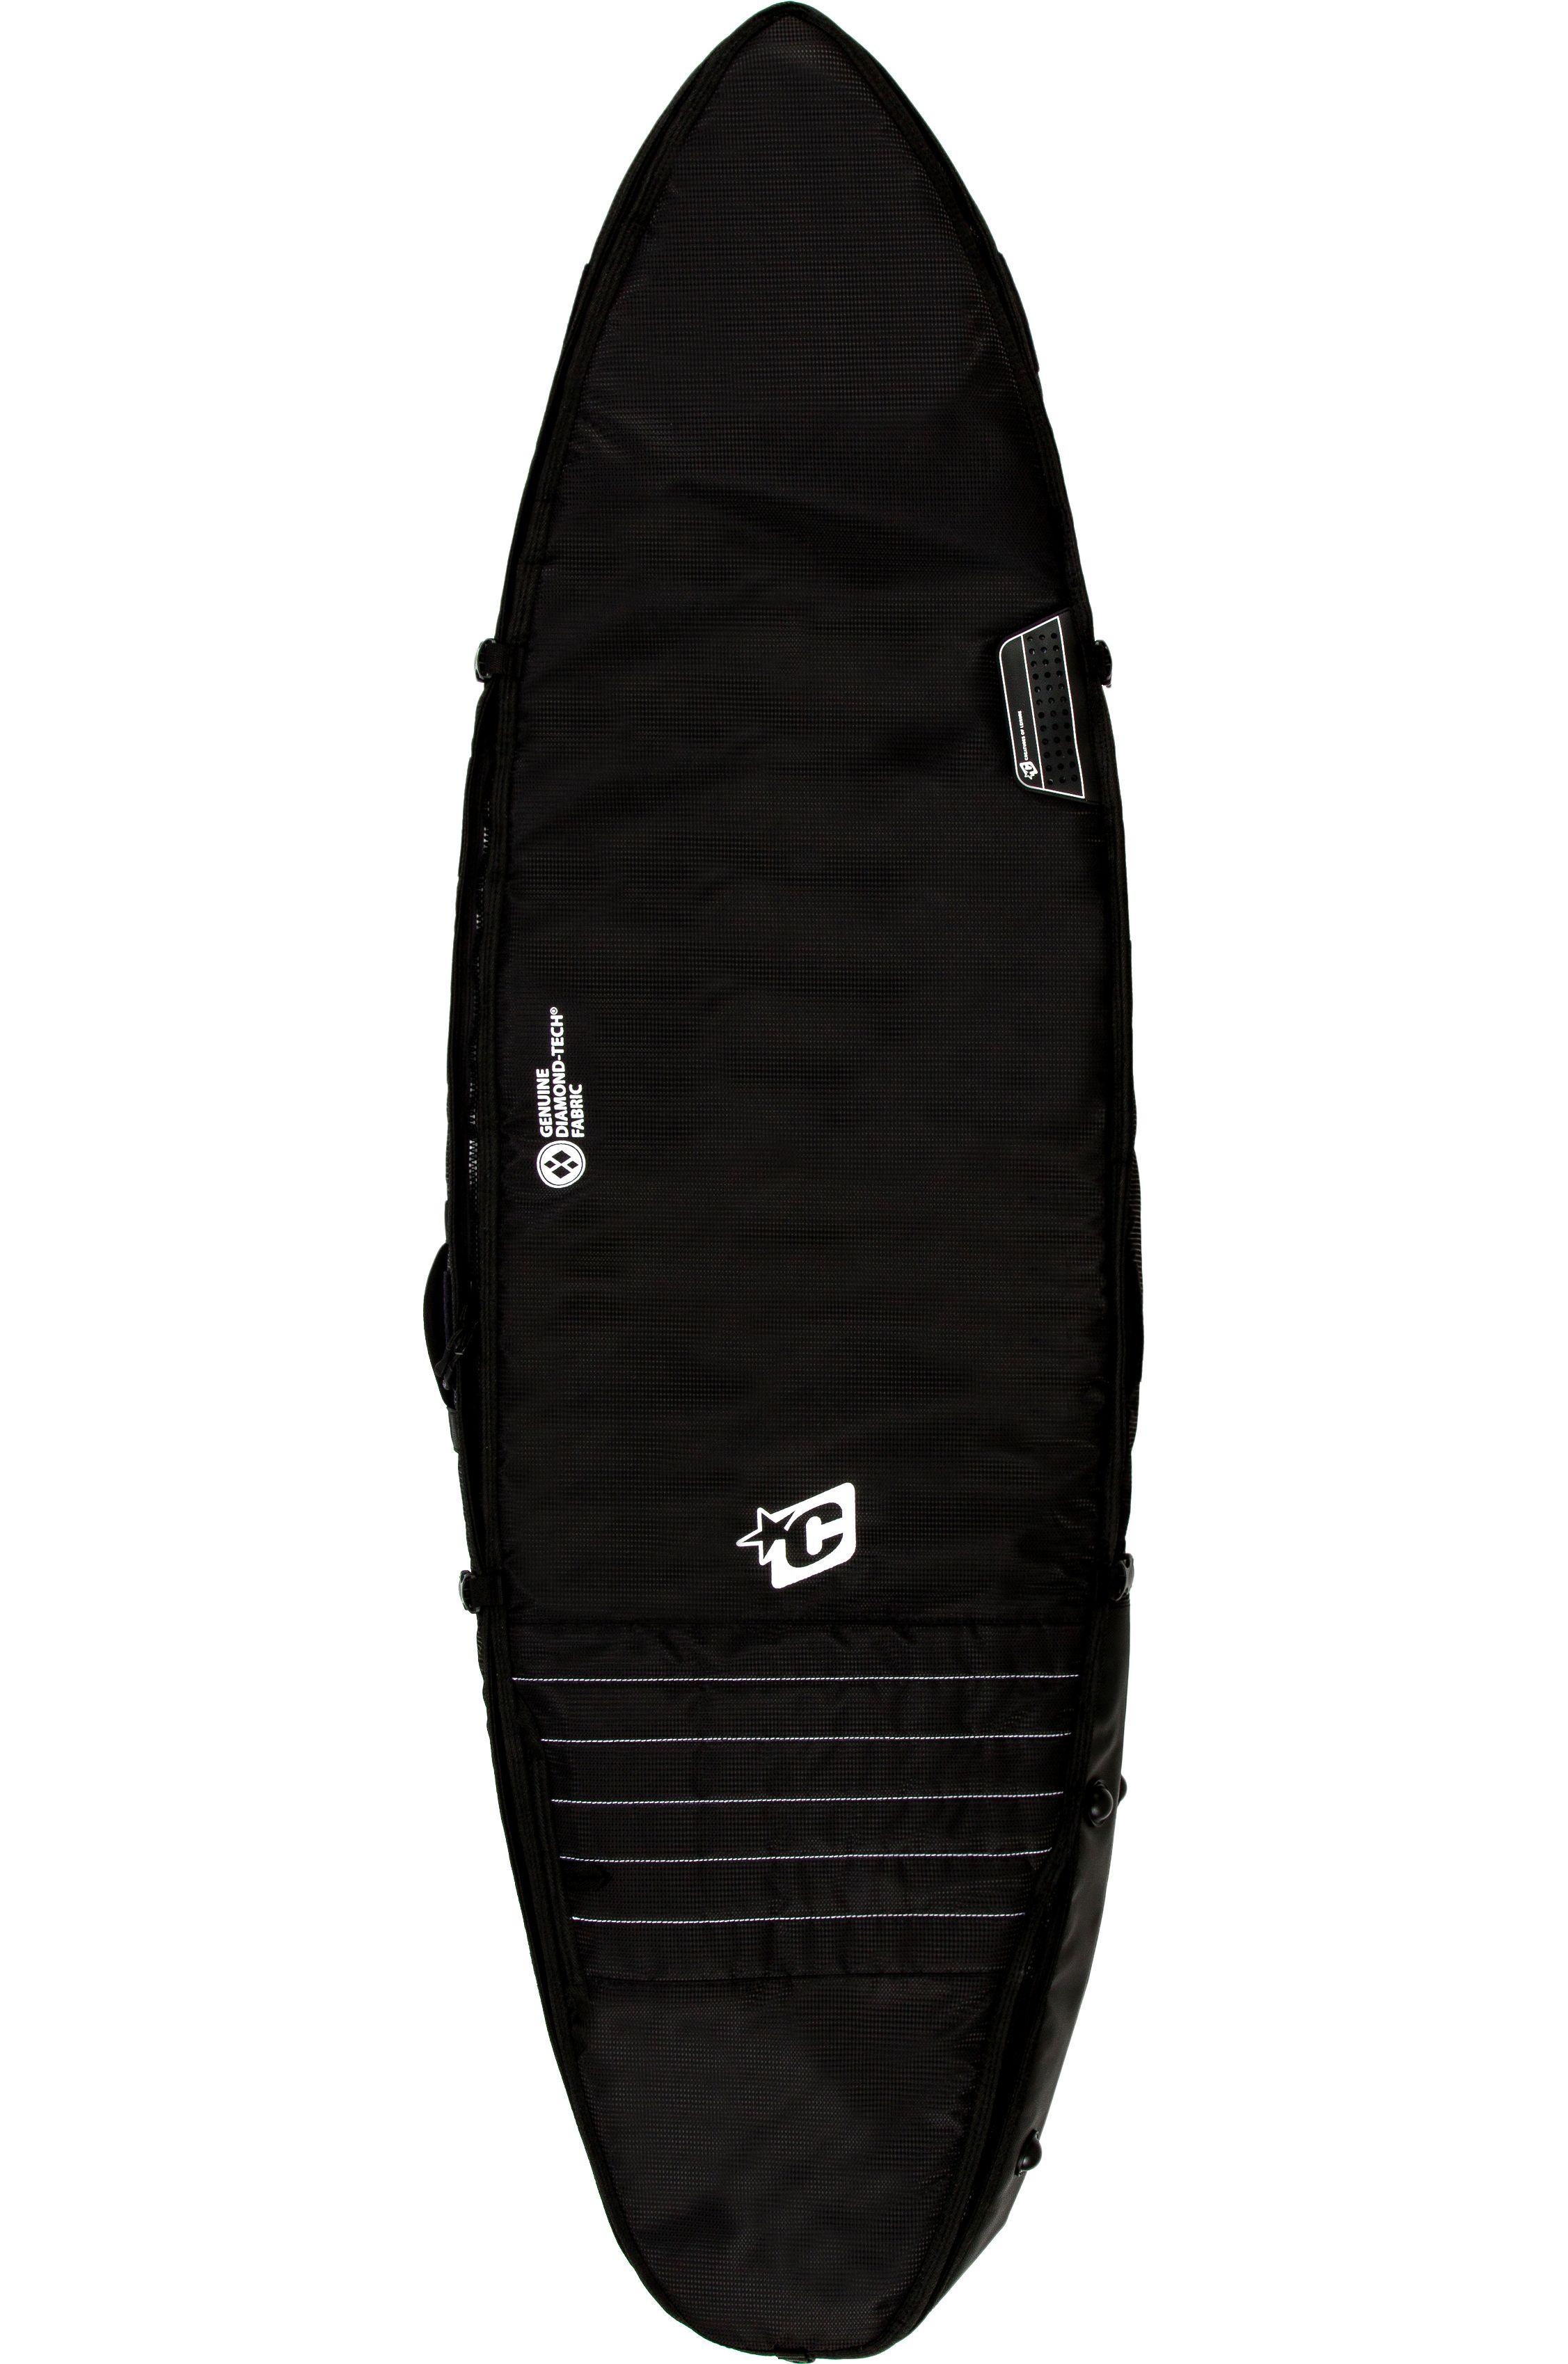 Capa Creatures 6ft3 SHORTBOARD TRIPLE Black White